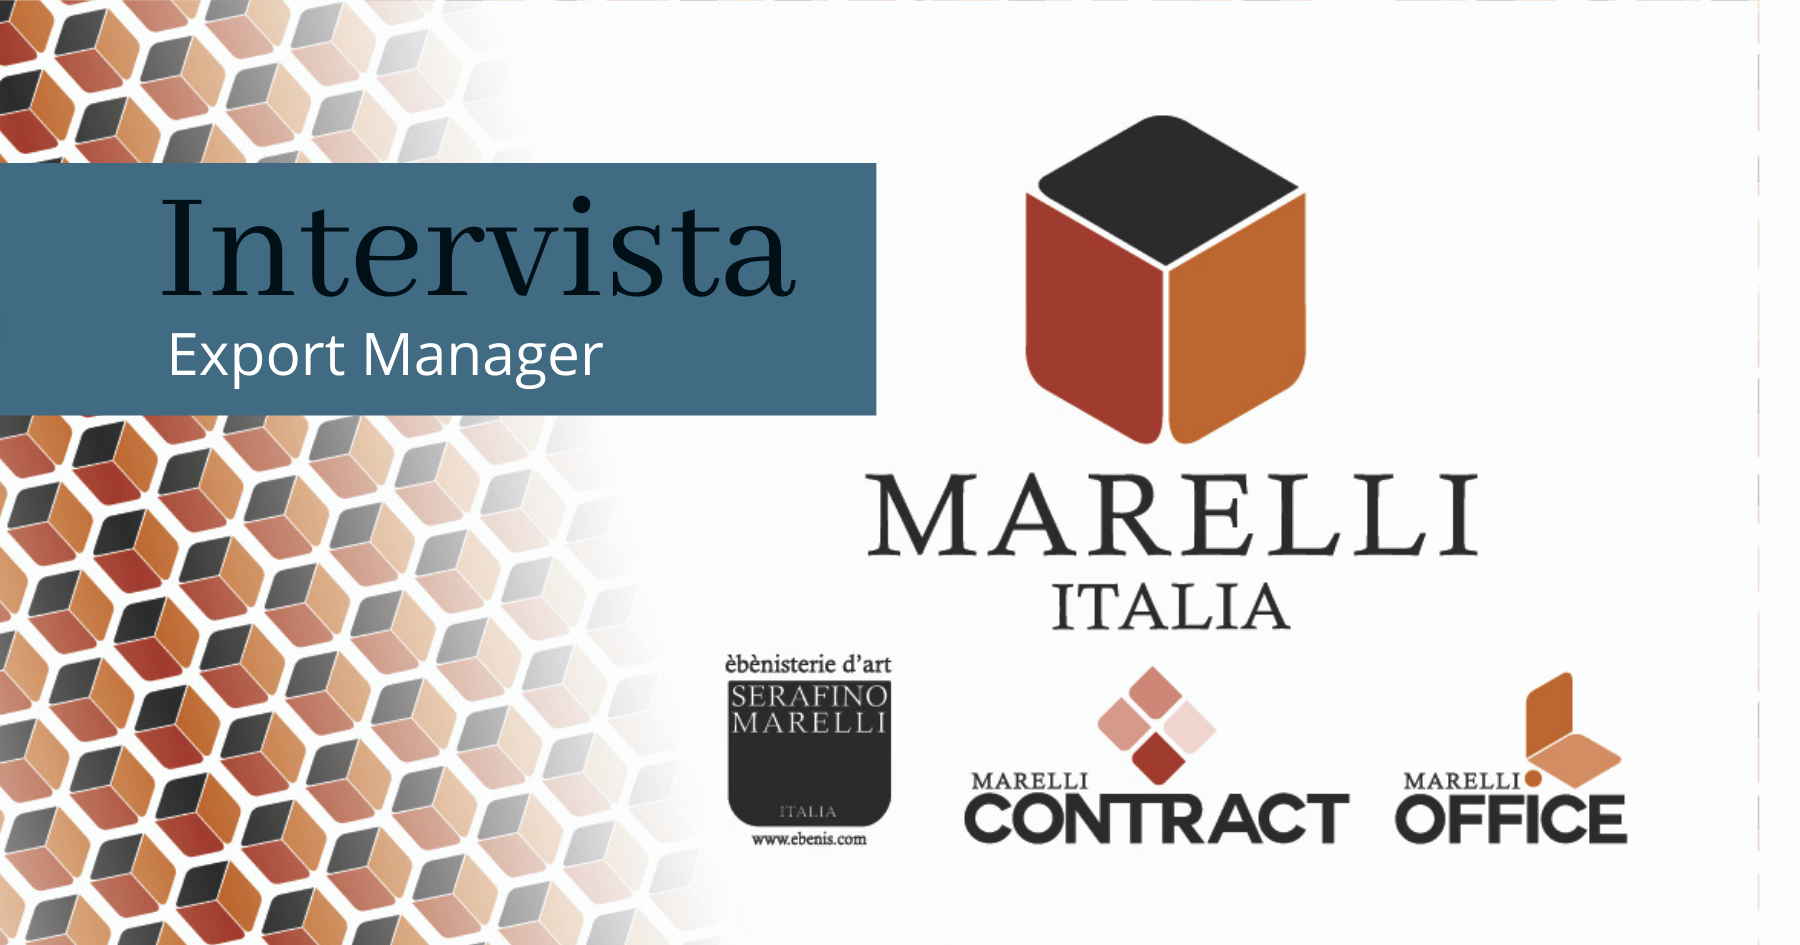 Intervista Export Manager